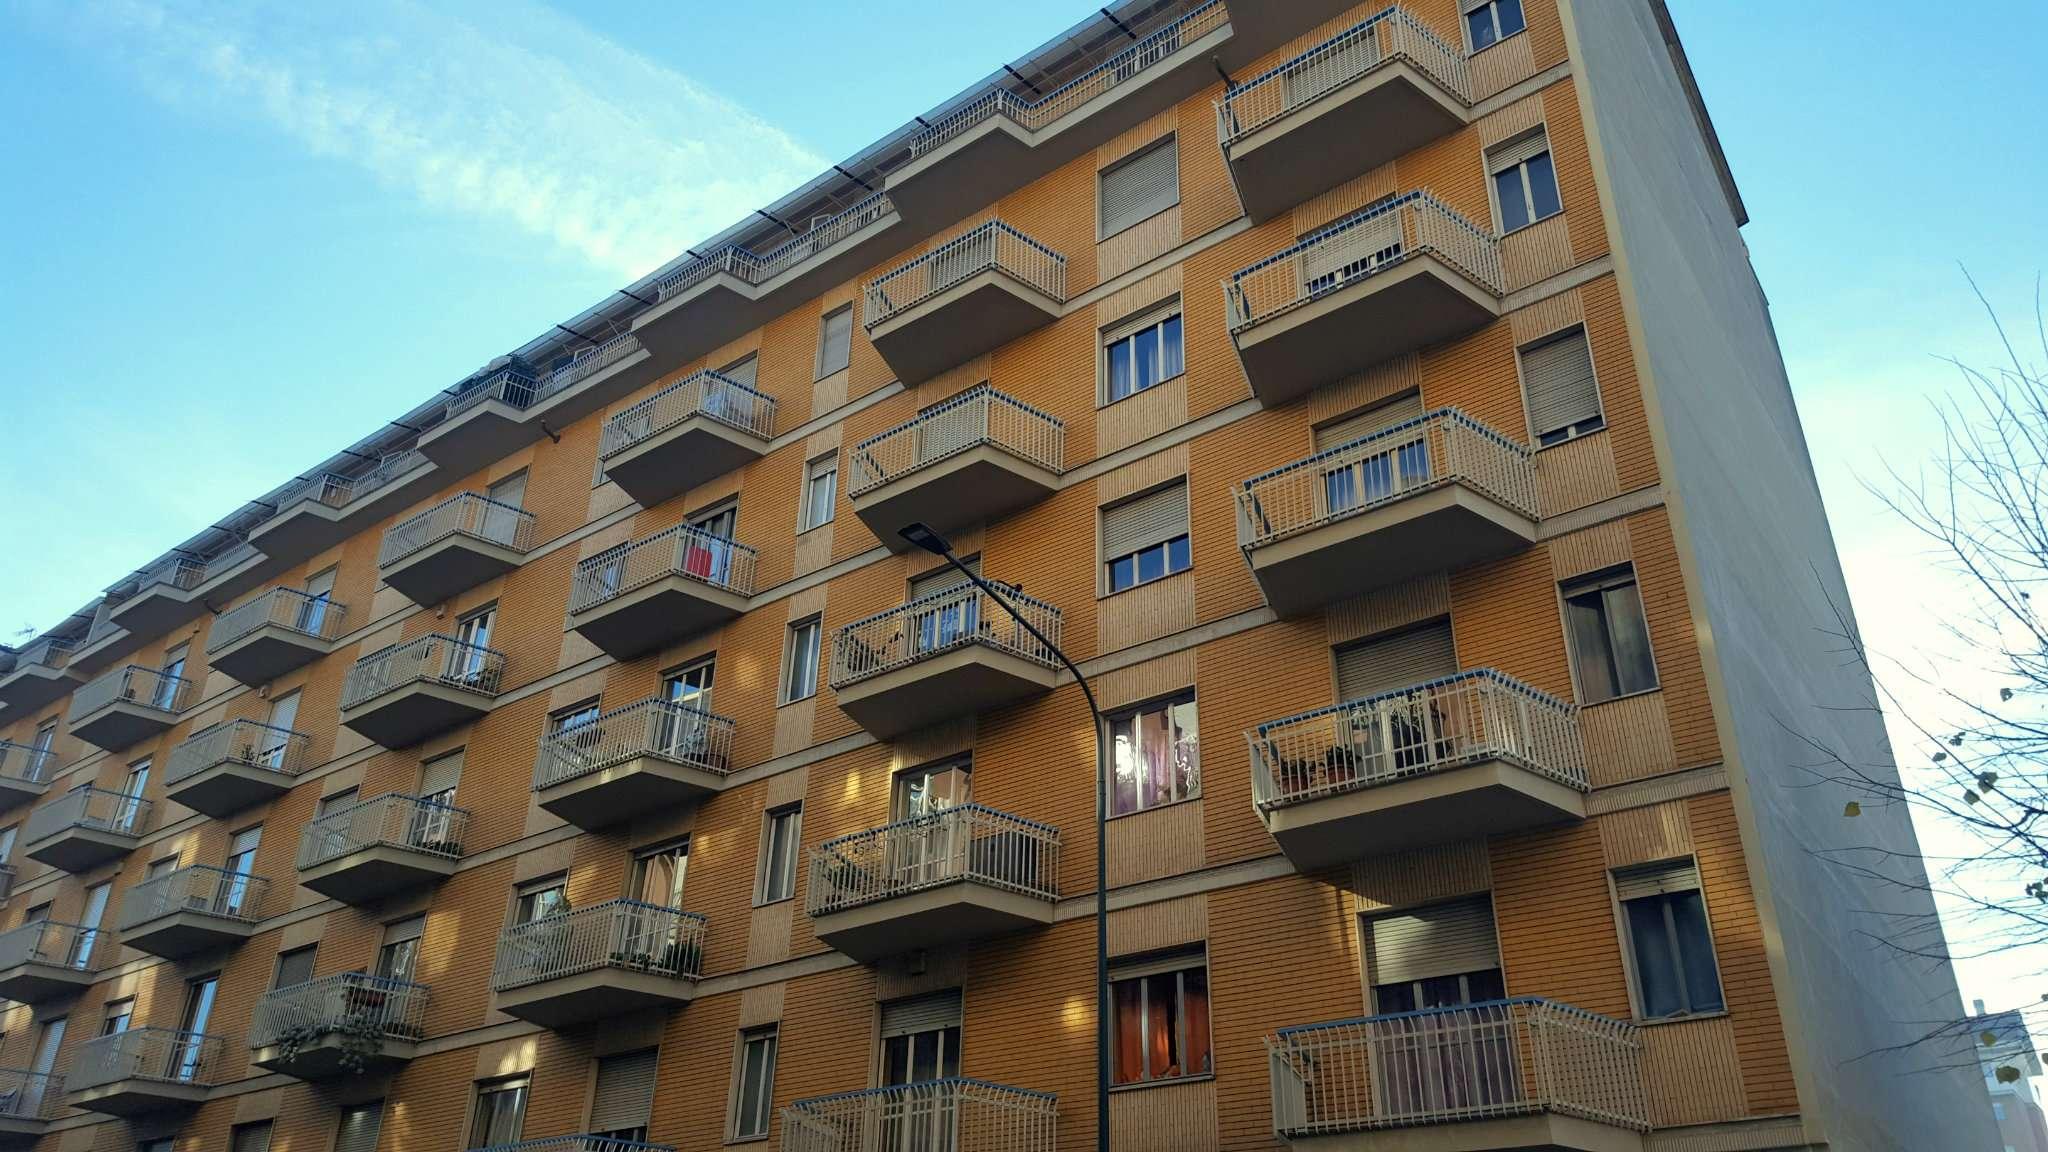 Appartamento in affitto Zona Santa Rita - via Baltimora 83 Torino